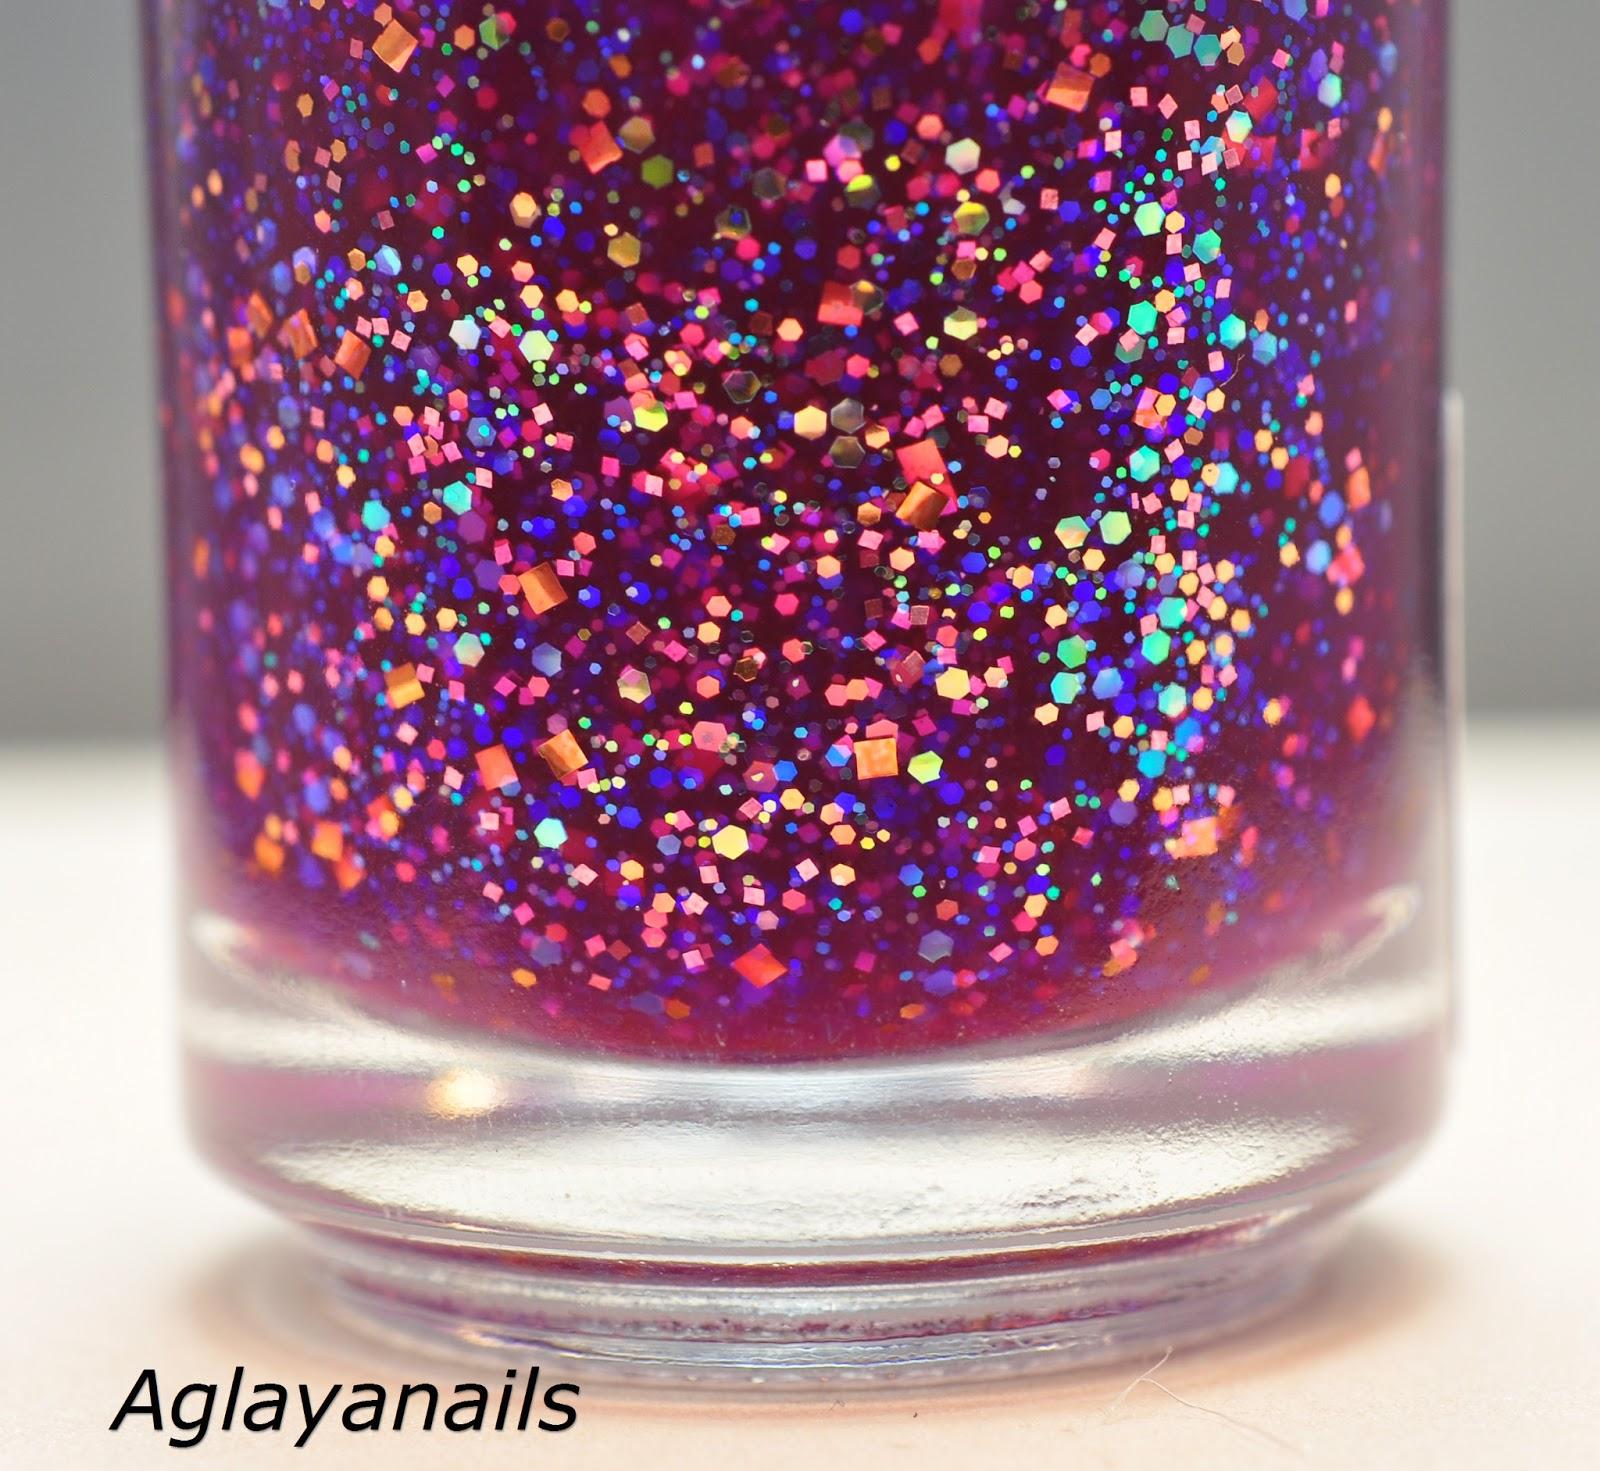 Aglayanails: Visions of Sugar Plums